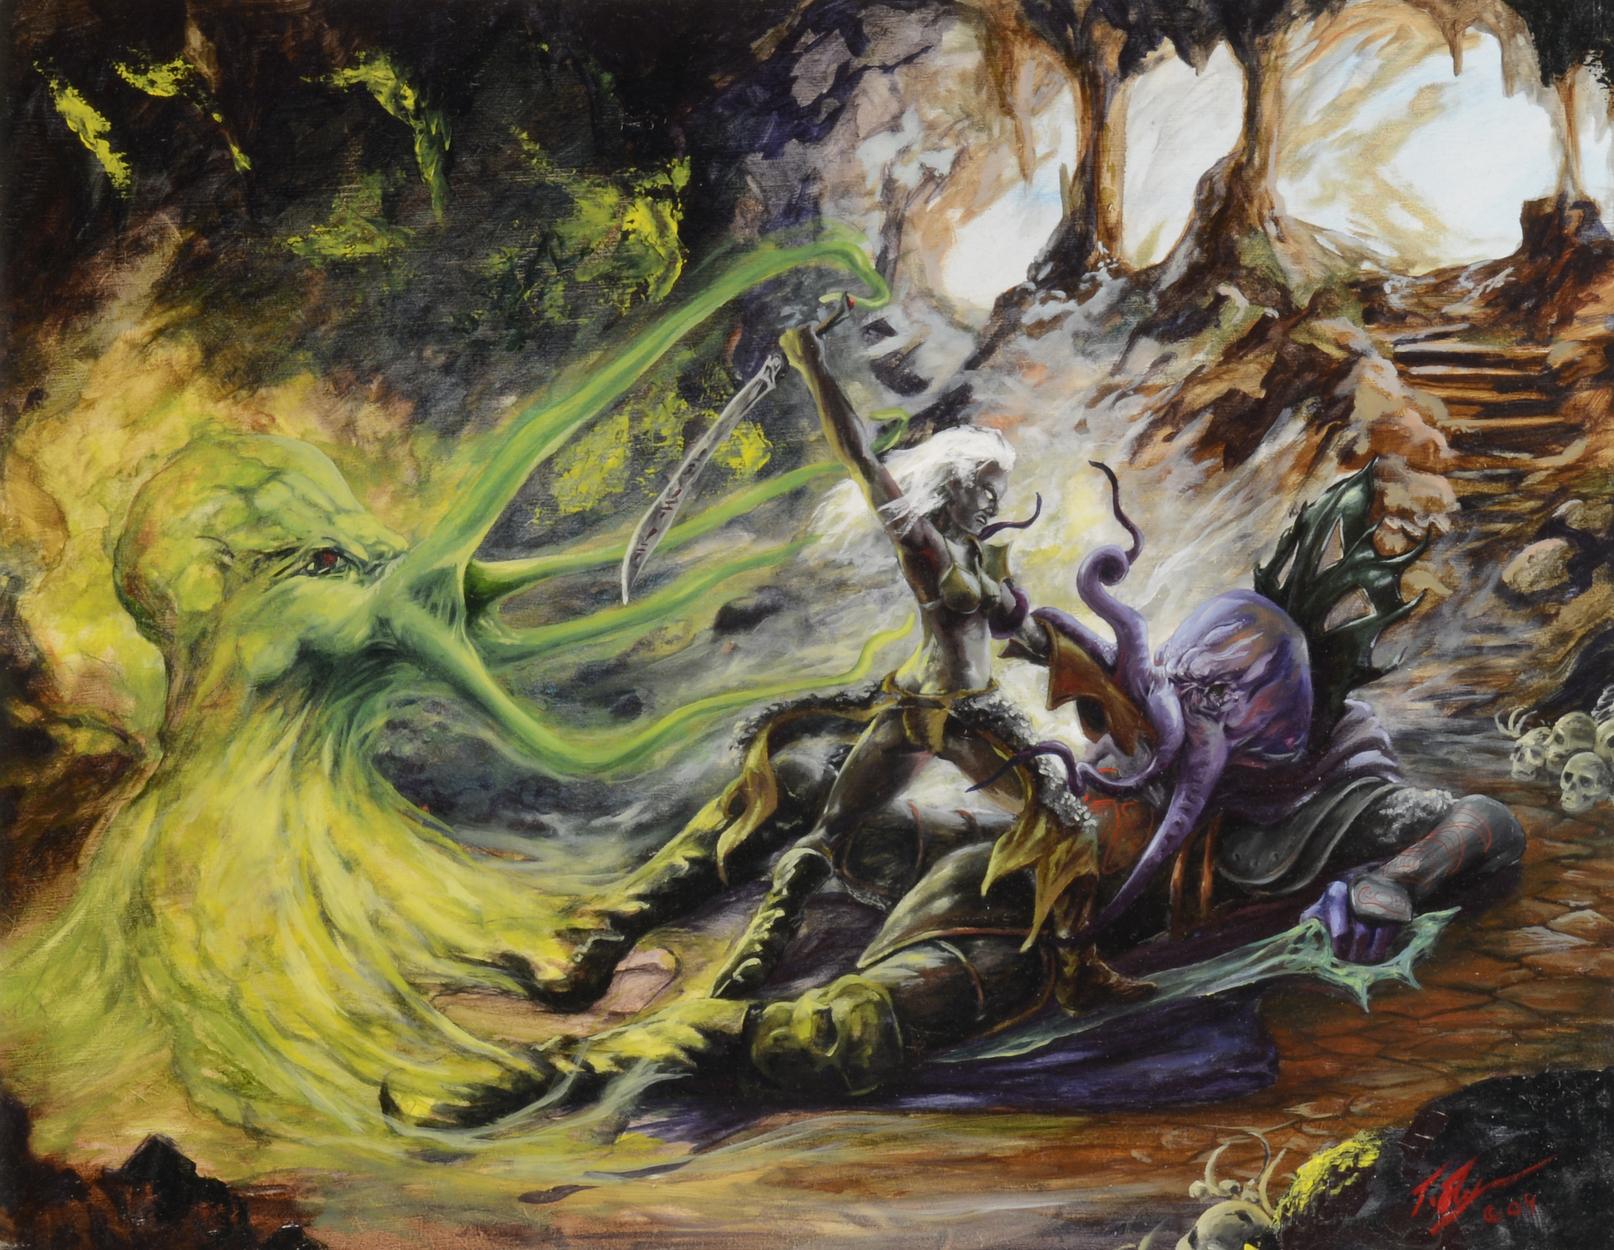 DROW VS FLAYER Artwork by Tracy E Flynn